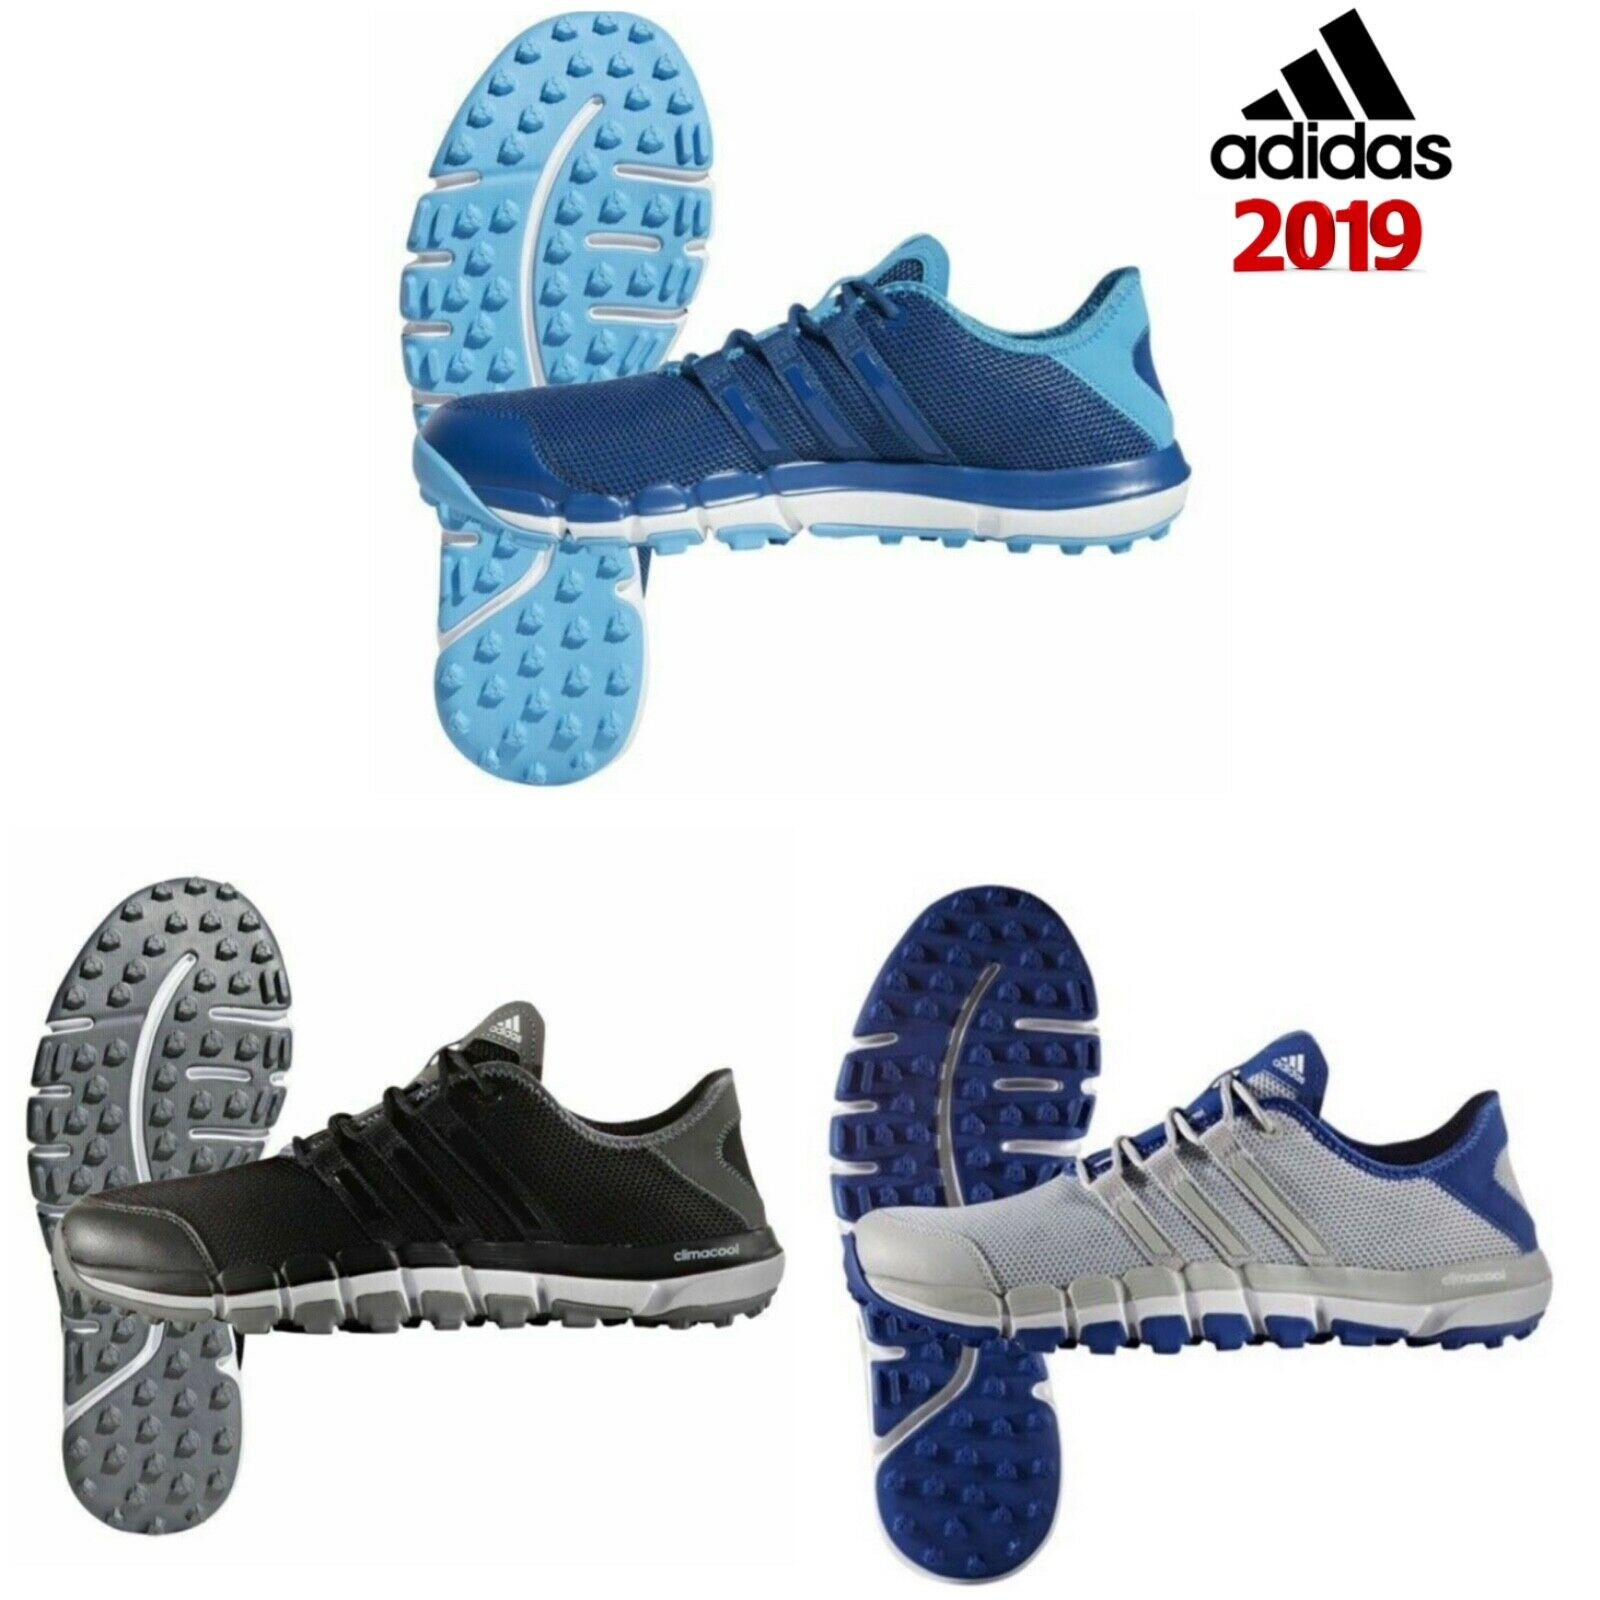 adidas climacool spikeless golf shoes off 67% - www.usushimd.com